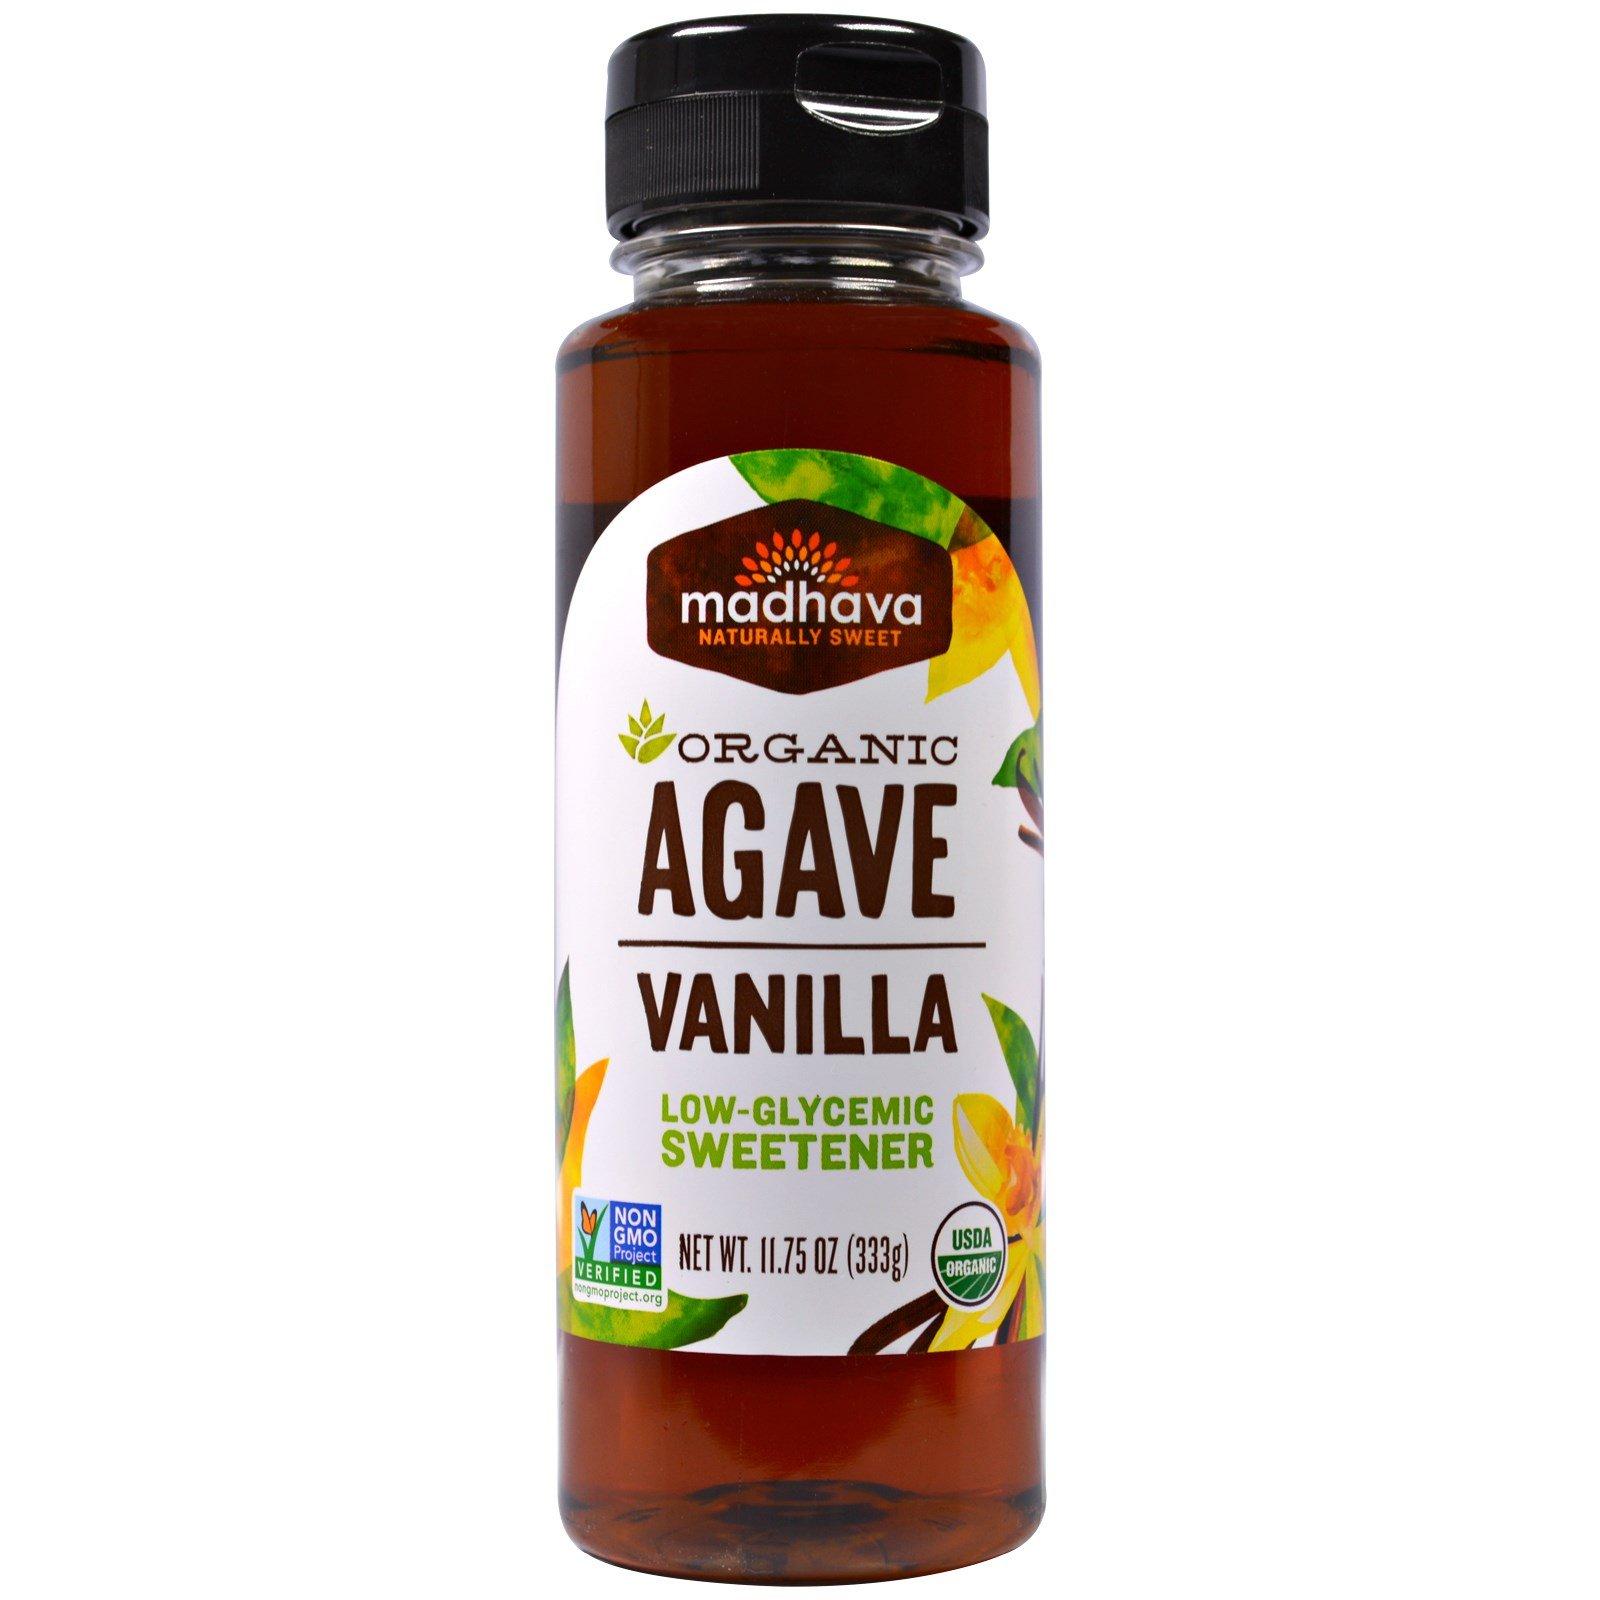 Madhava Natural Sweeteners, Organic Agave Nectar, Vanilla, 11.75 oz (333 g) - 2pcs